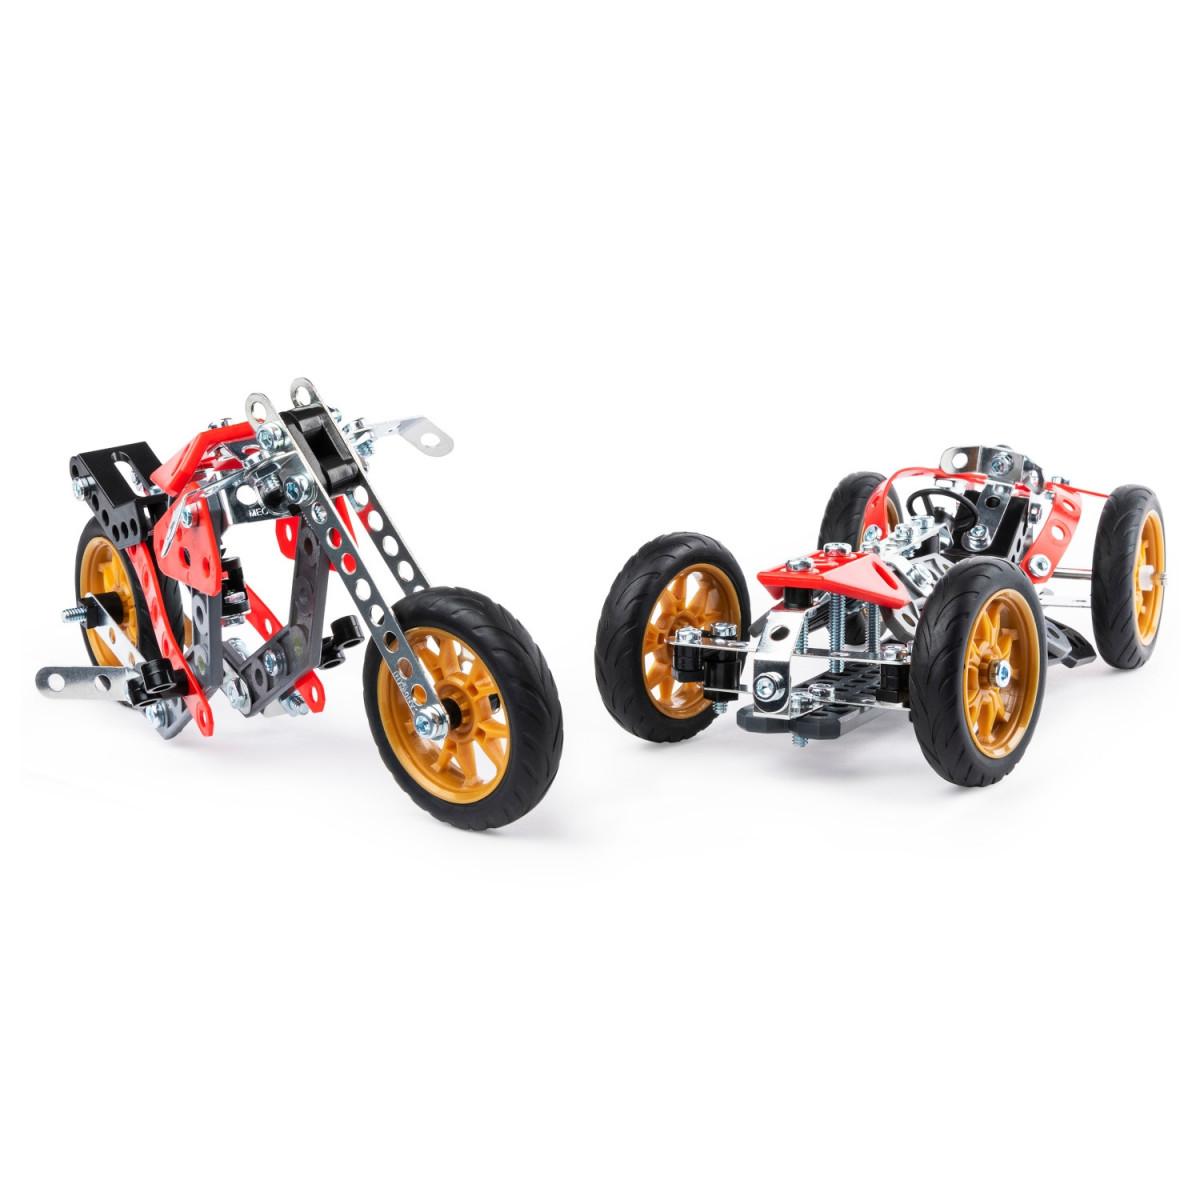 6053371 VOITURE ET MOTO 5 MODELES MECCANO